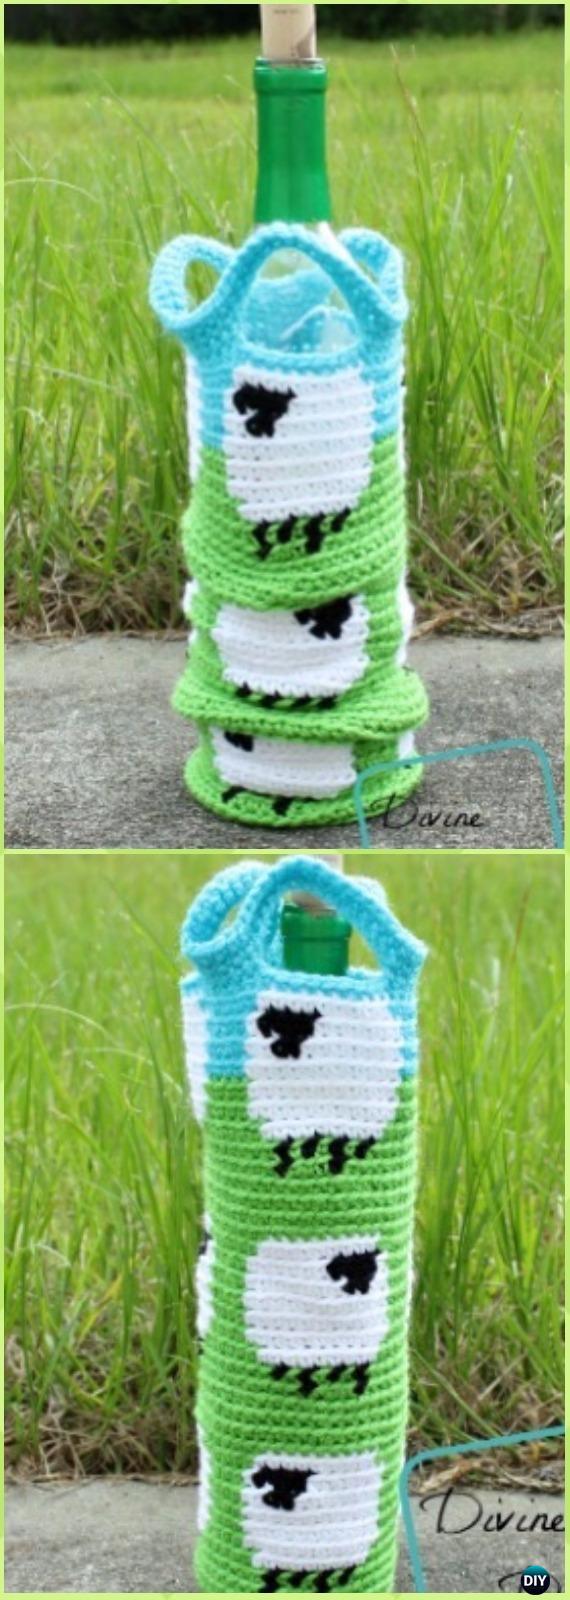 Crochet Wine Bottle Cozy Bag Amp Sack Free Patterns